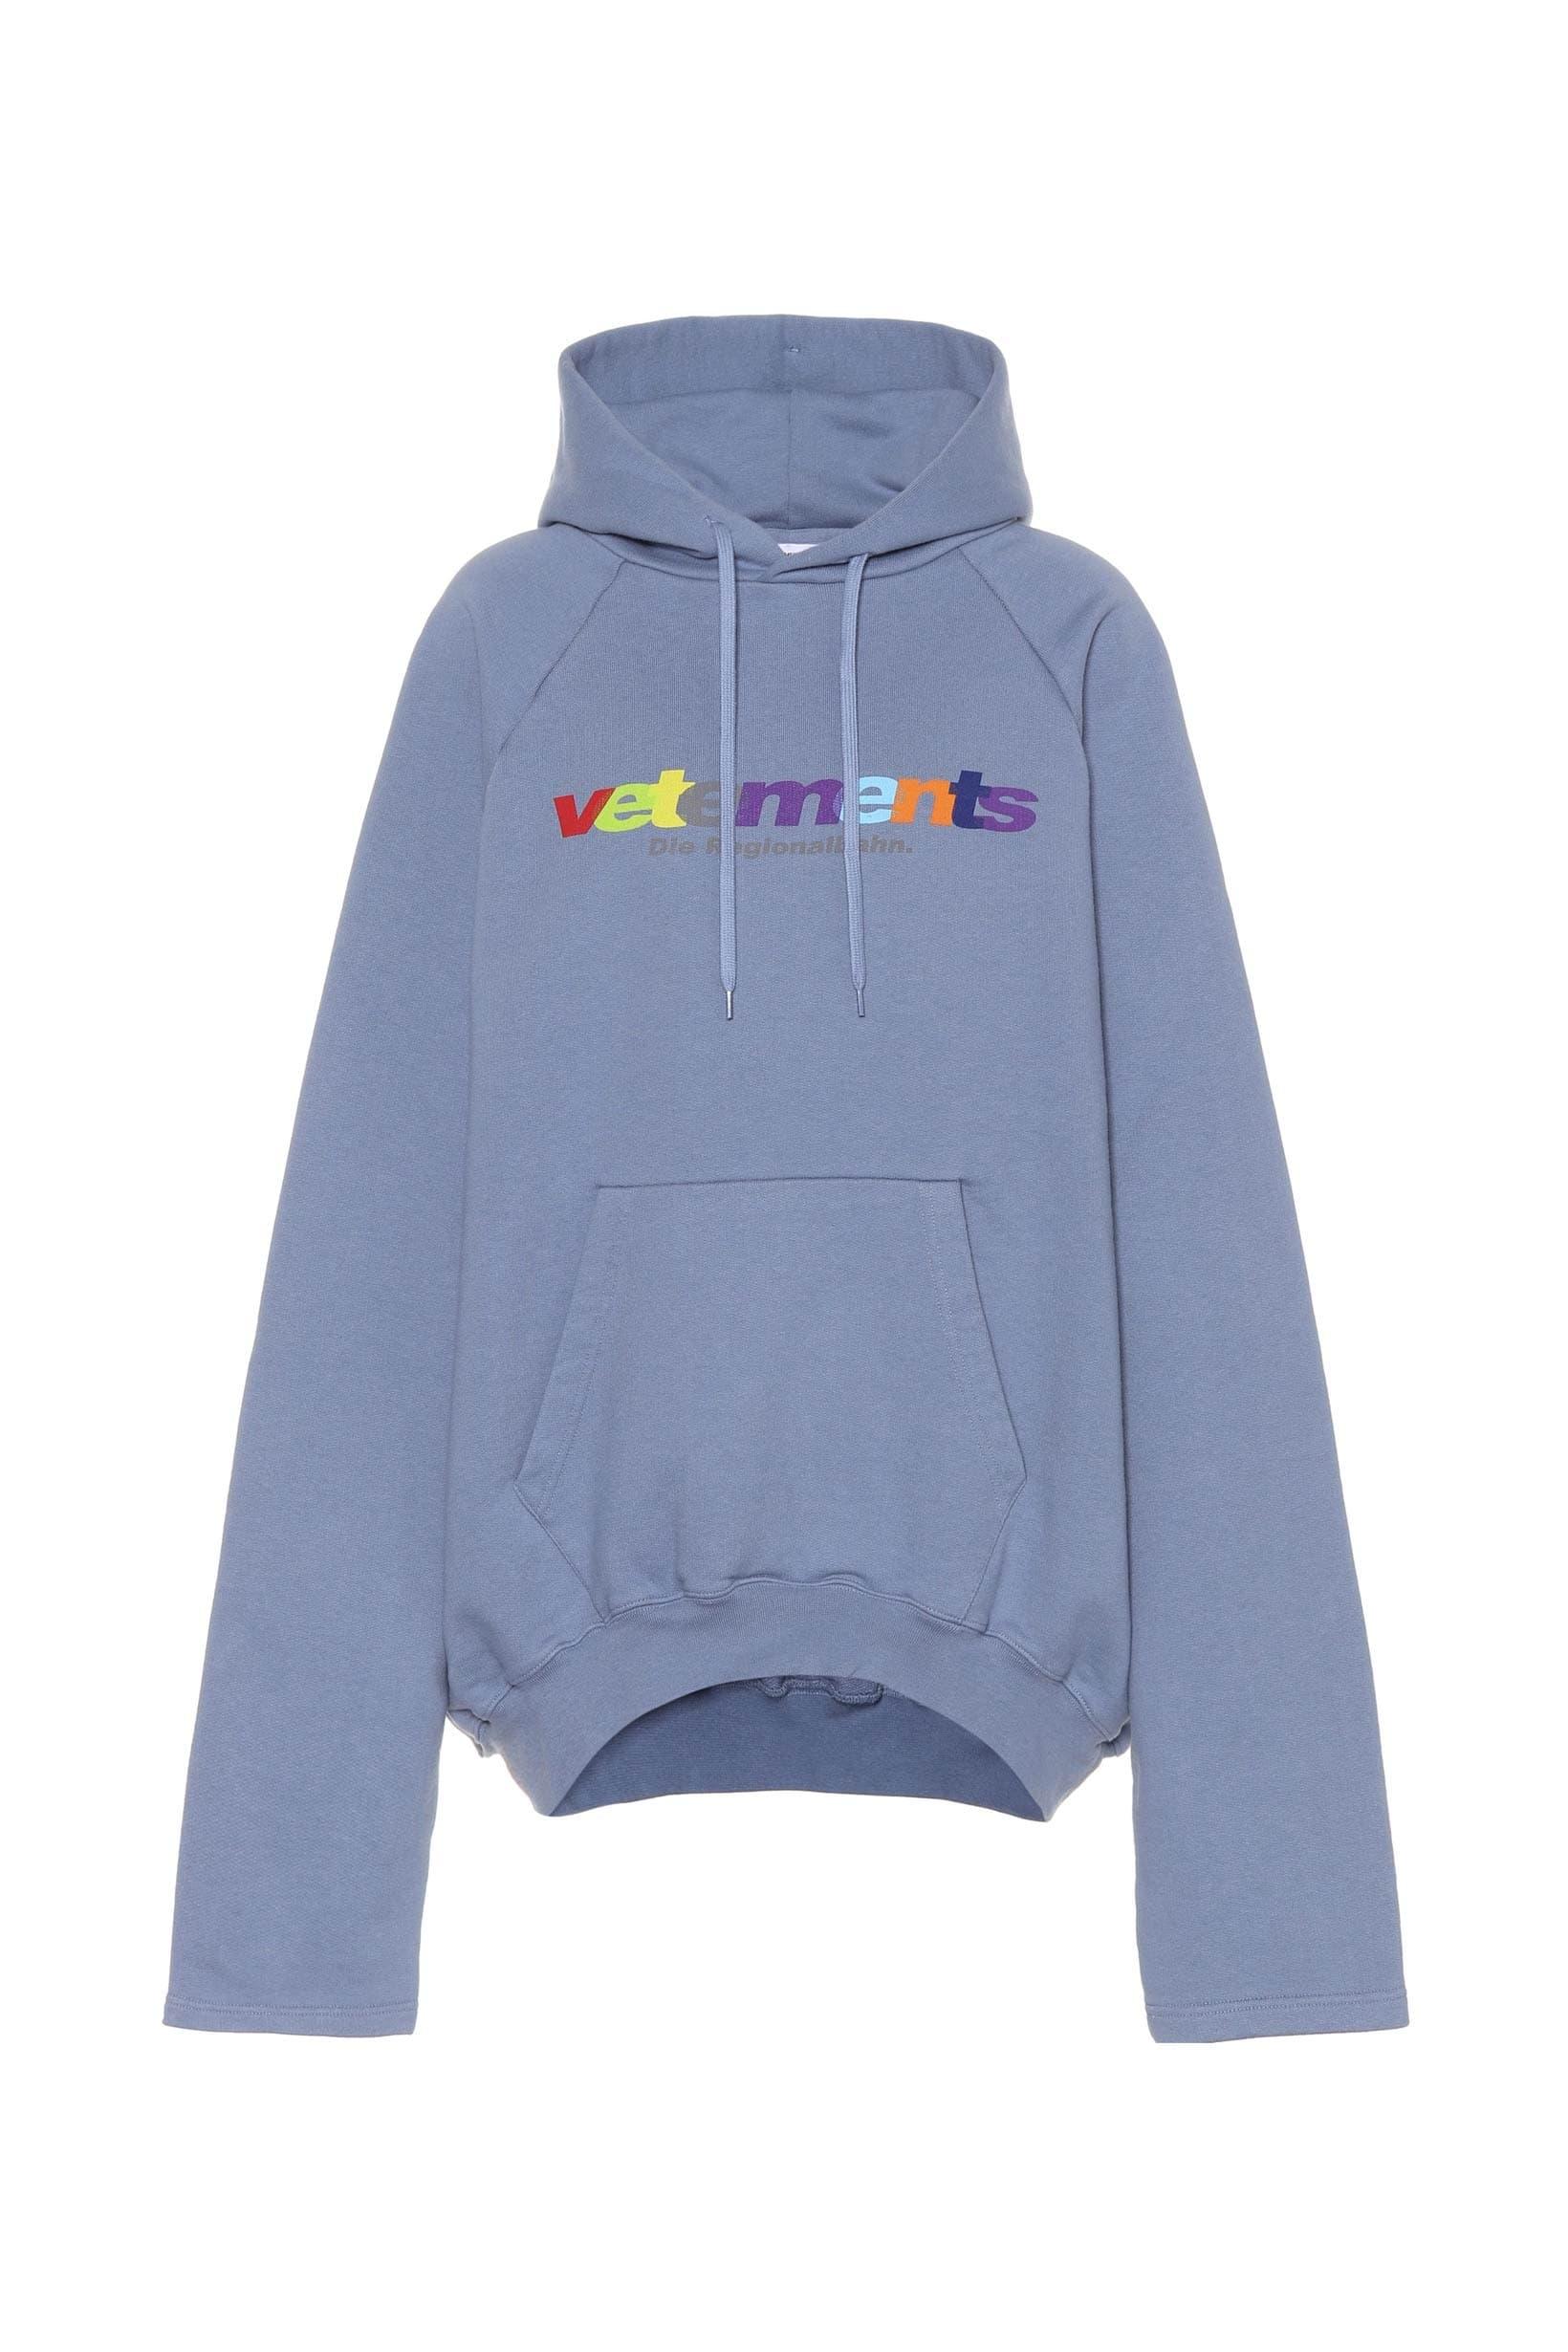 Buy Vetements Rainbow Logo Hoodie T Shirt Now Hypebae